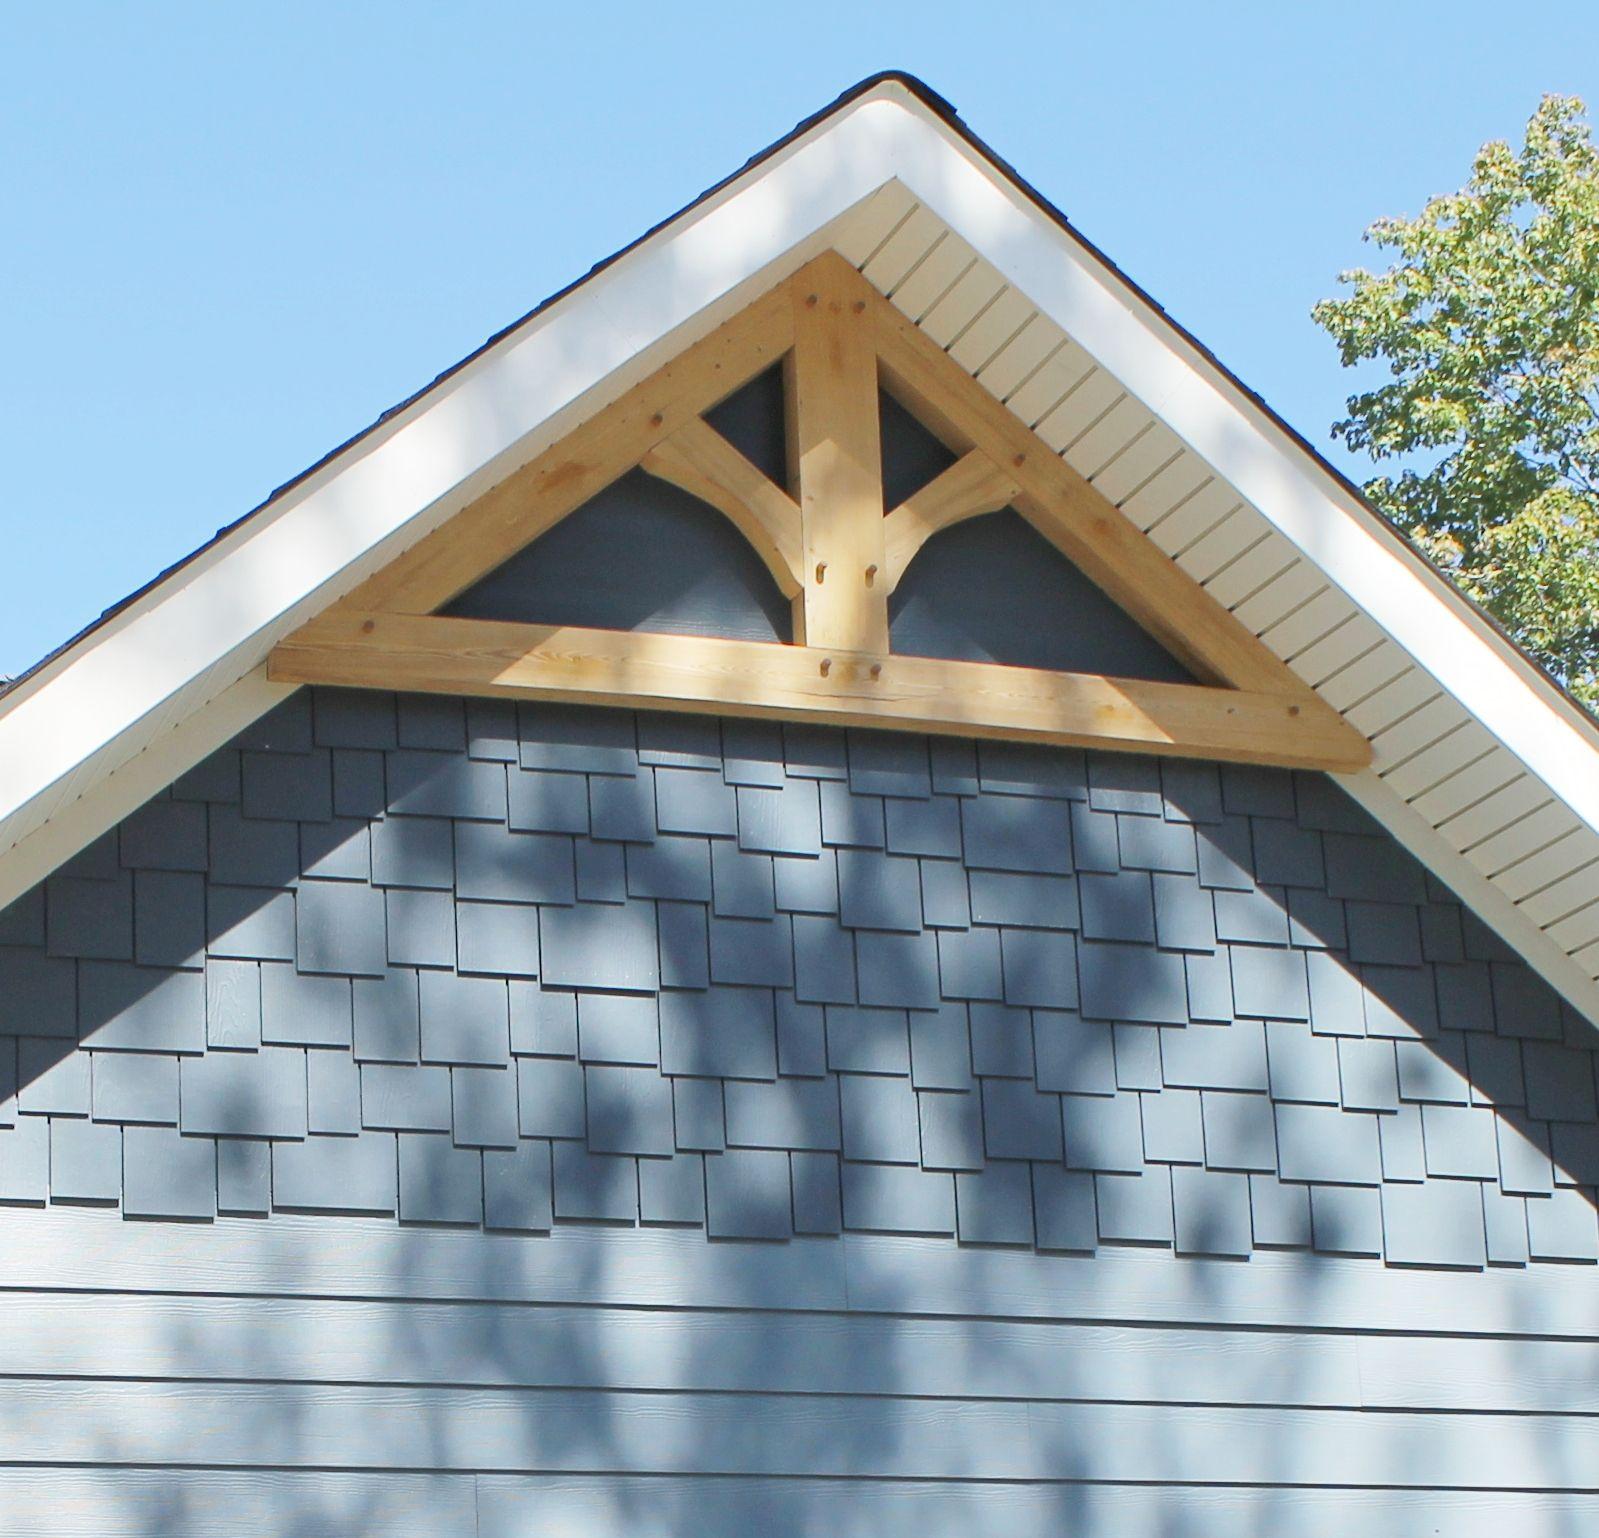 Timber Frame Truss Timber Frame Accent Homestead